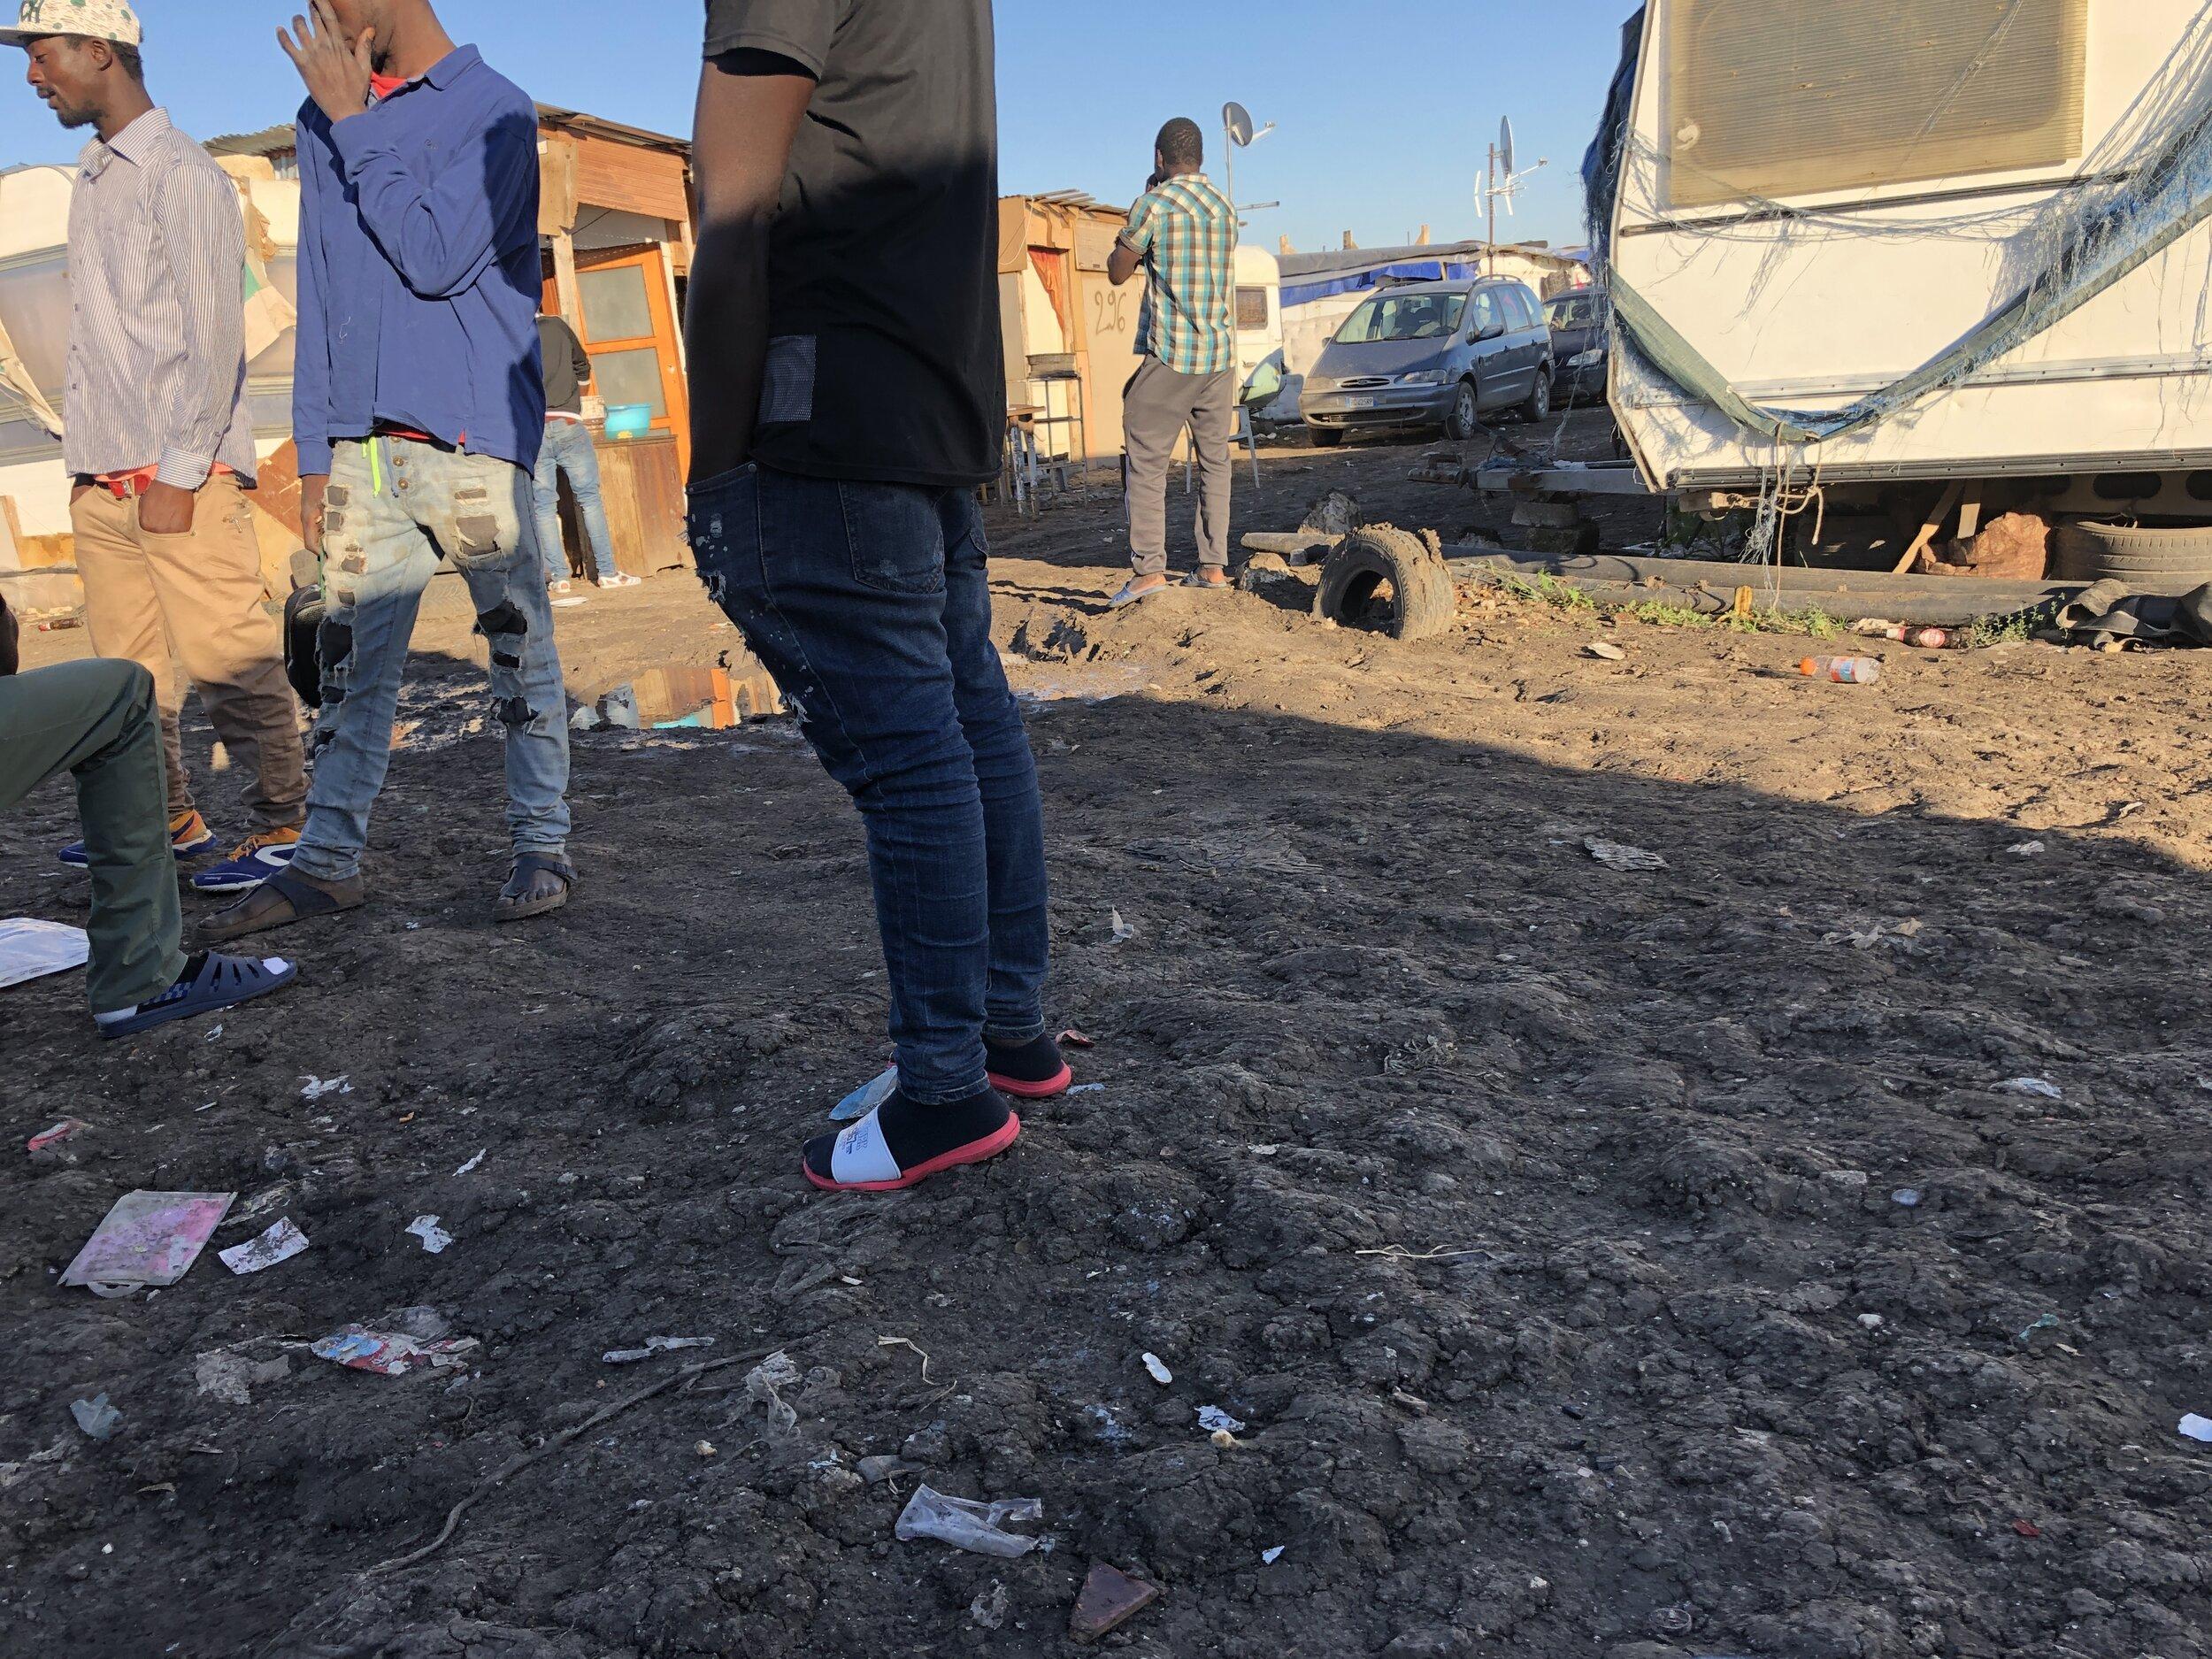 Gran Ghetto. Foggia, Italy. 8 October 2019. ©Pamela Kerpius